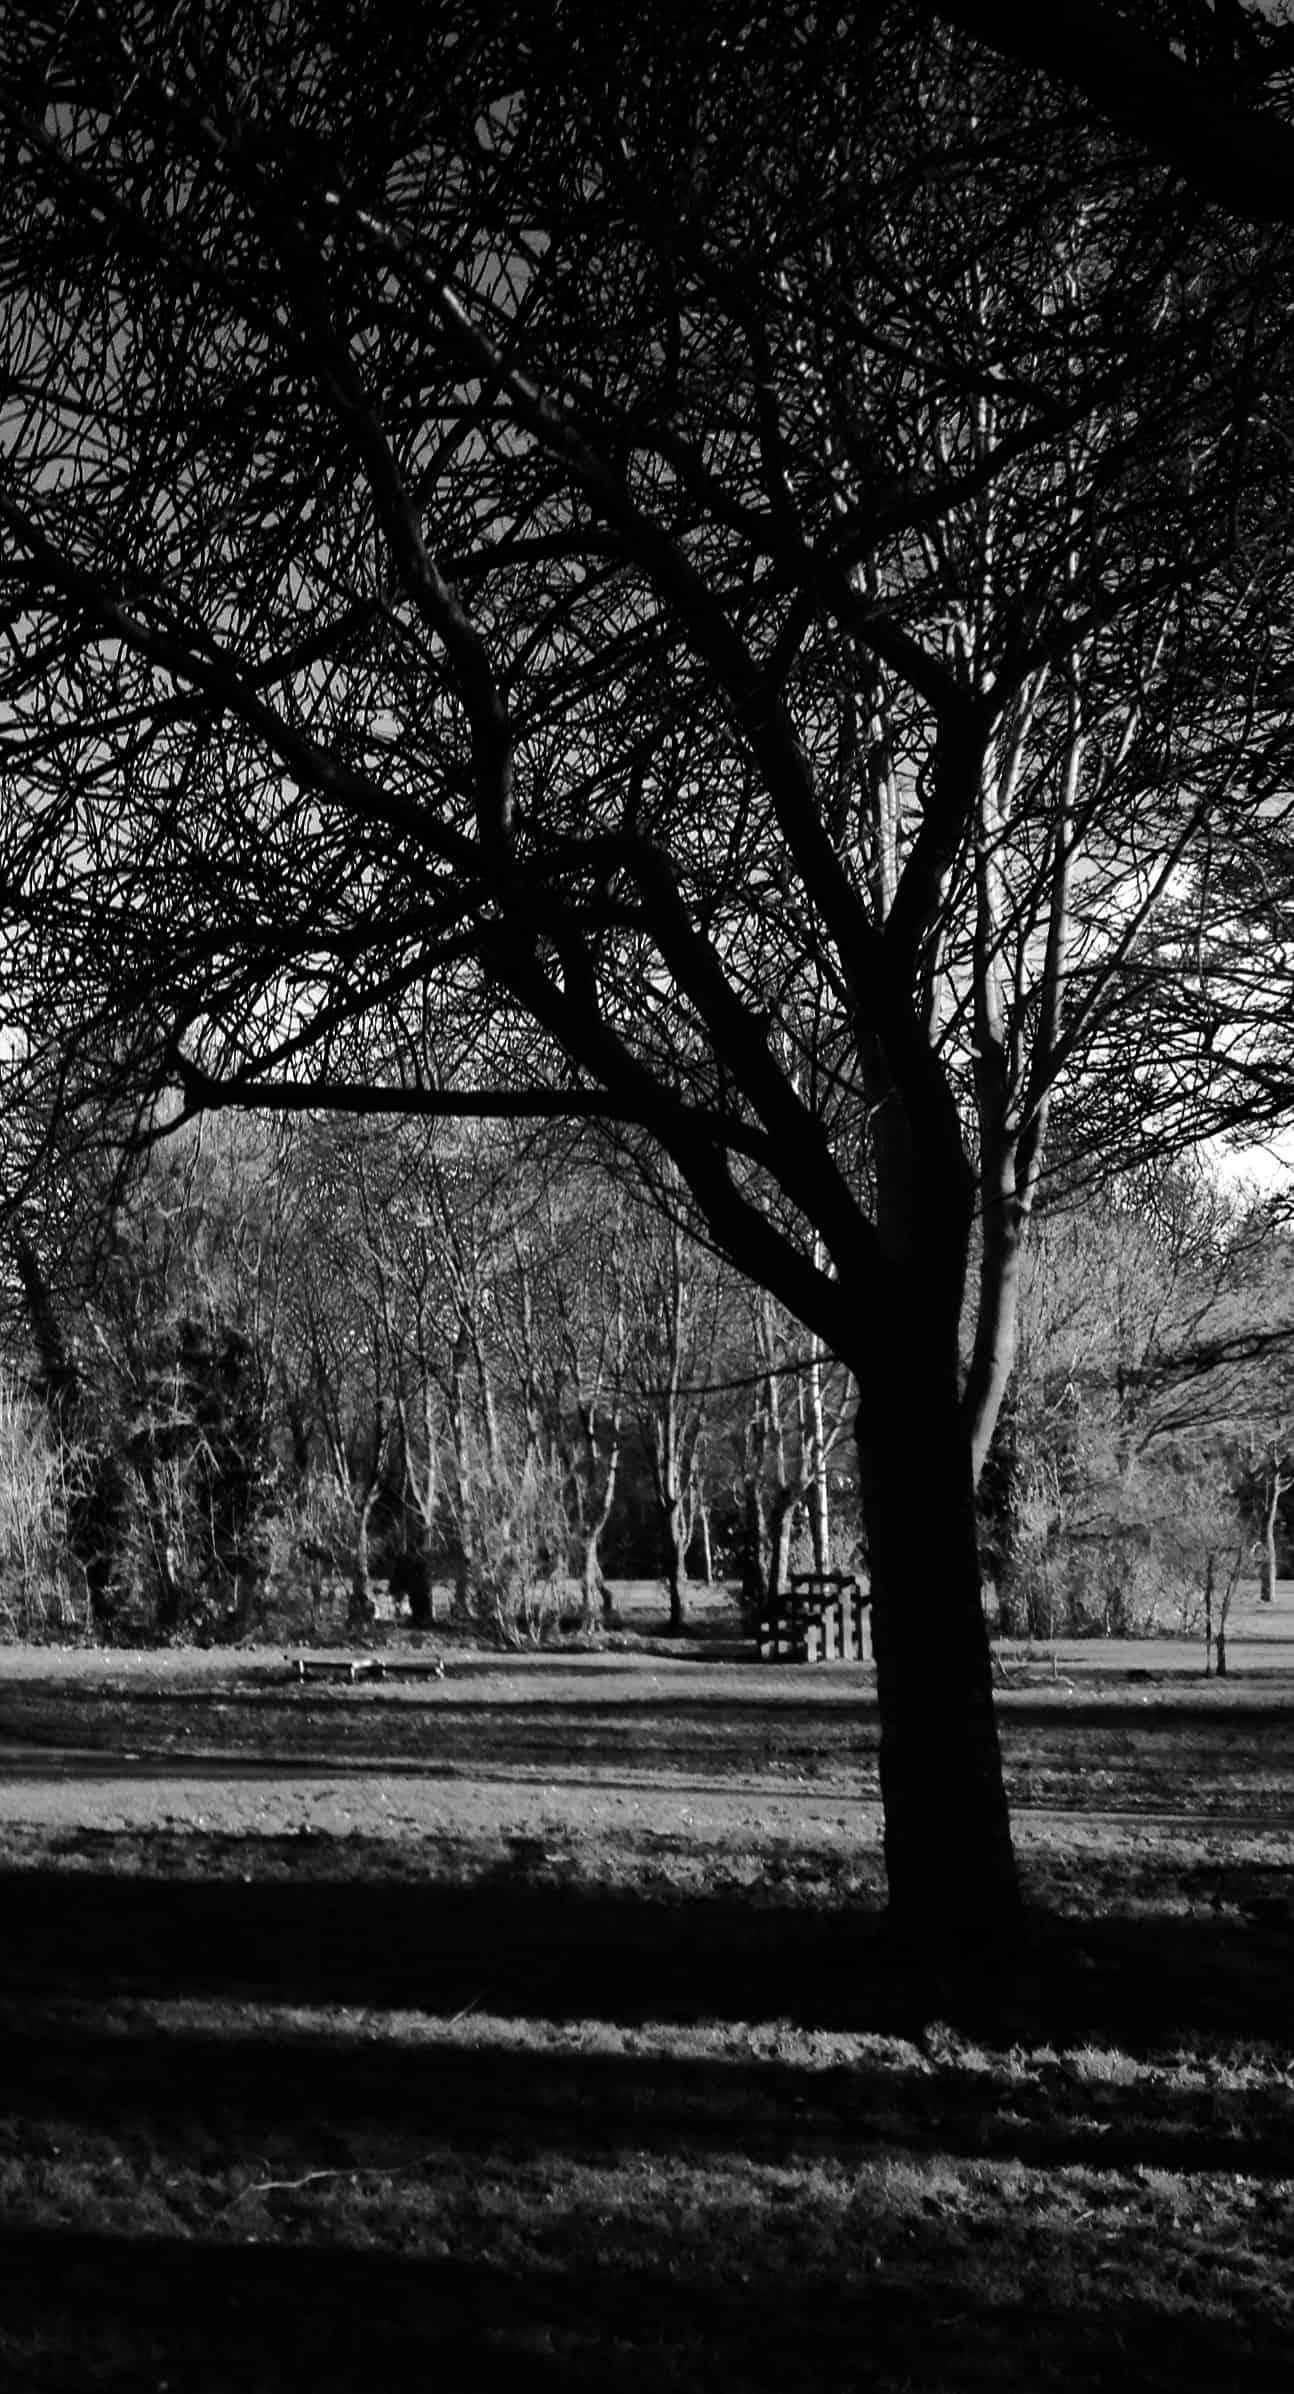 park drama, Drama on the Park